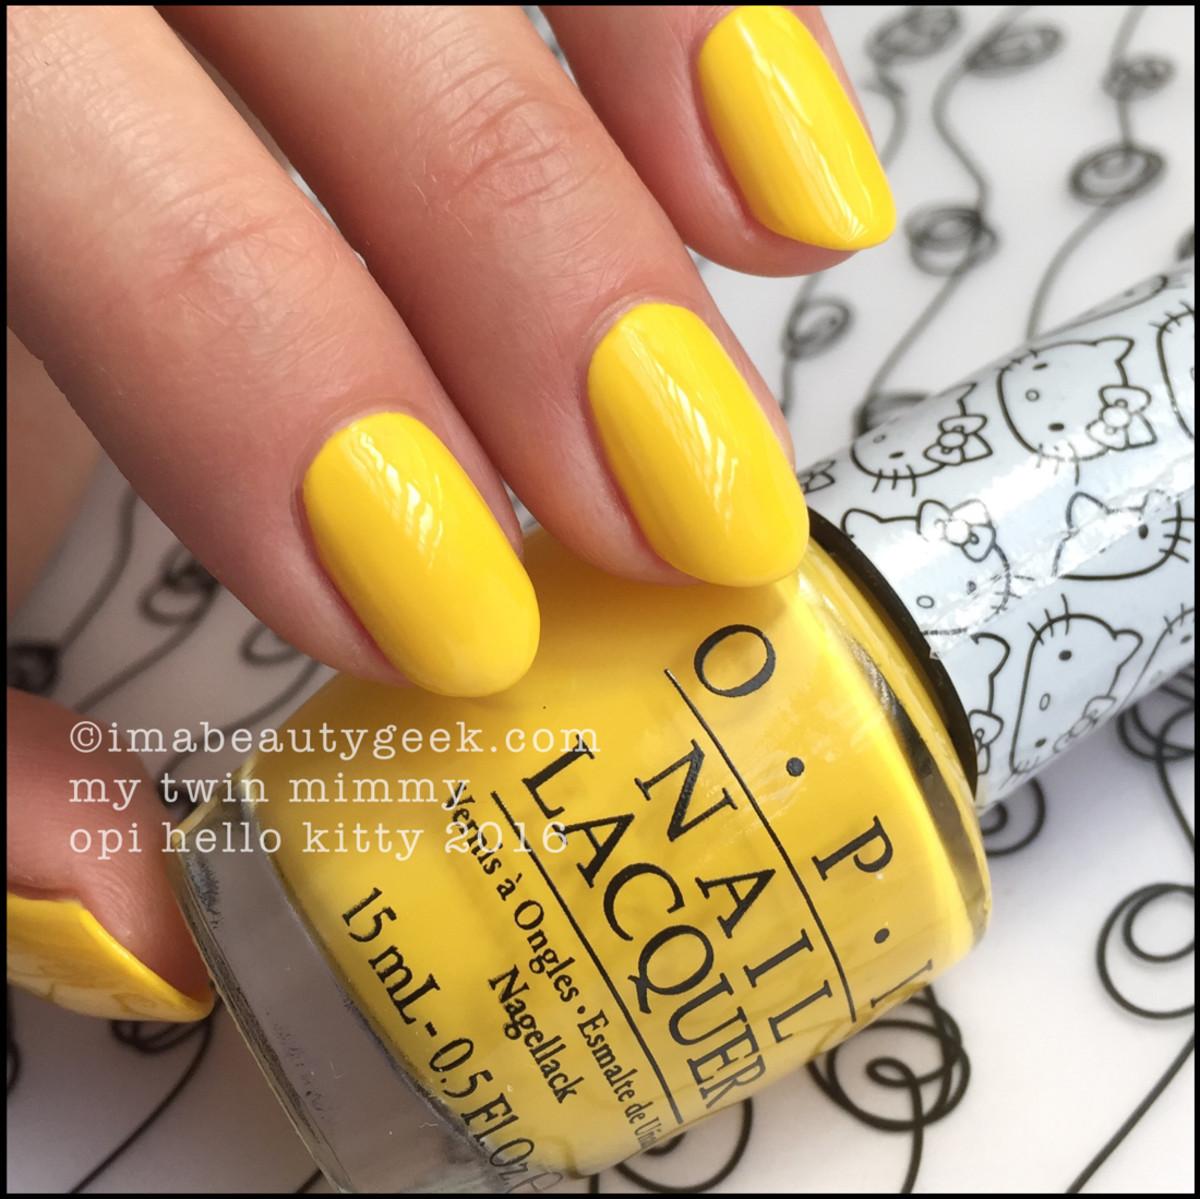 OPI Hello Kitty_OPI My Twin Mimmy Yellow